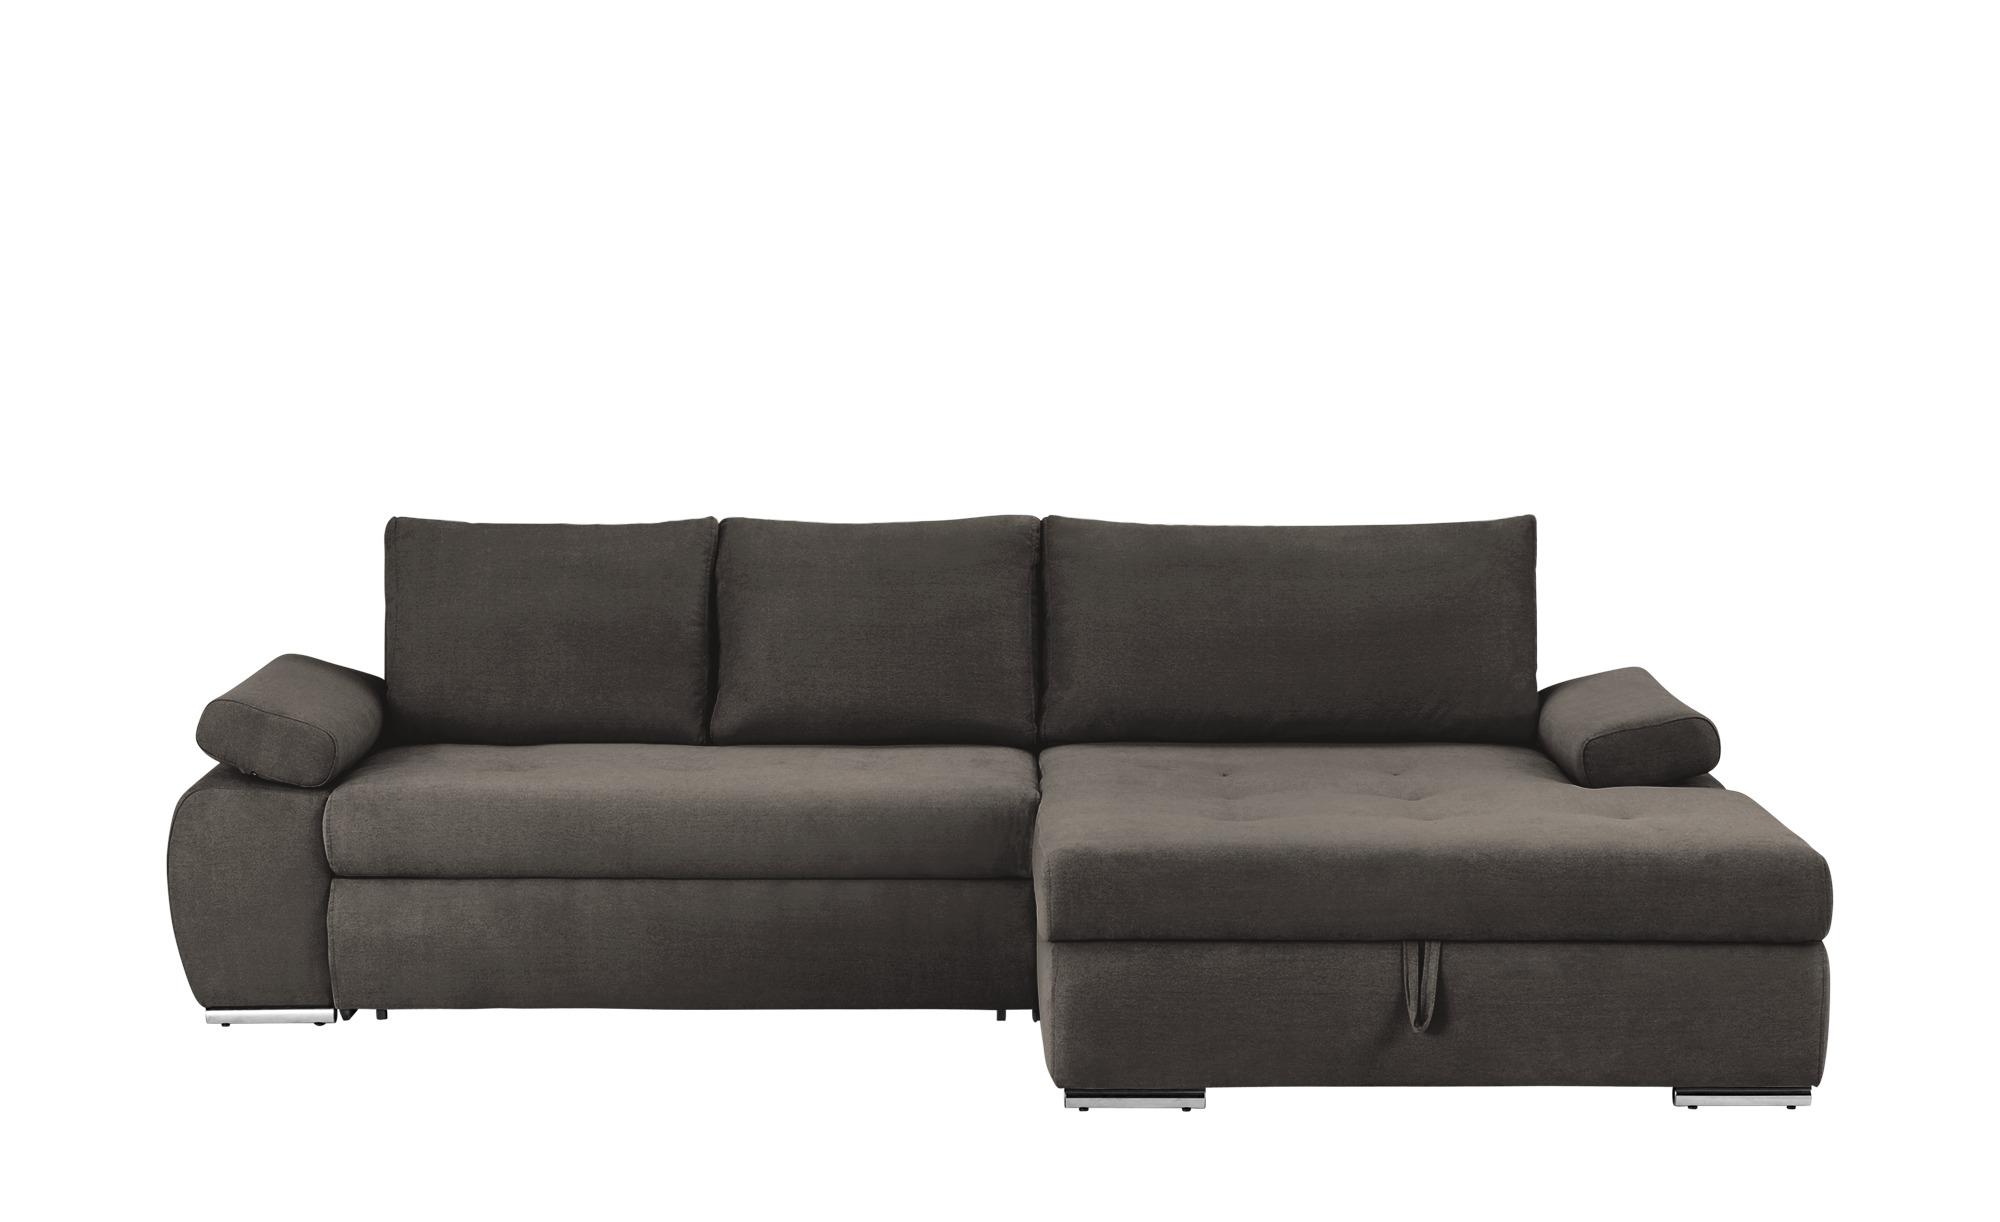 smart Ecksofa grau-braun - Flachgewebe Ibby | Sofa, Sofa ...